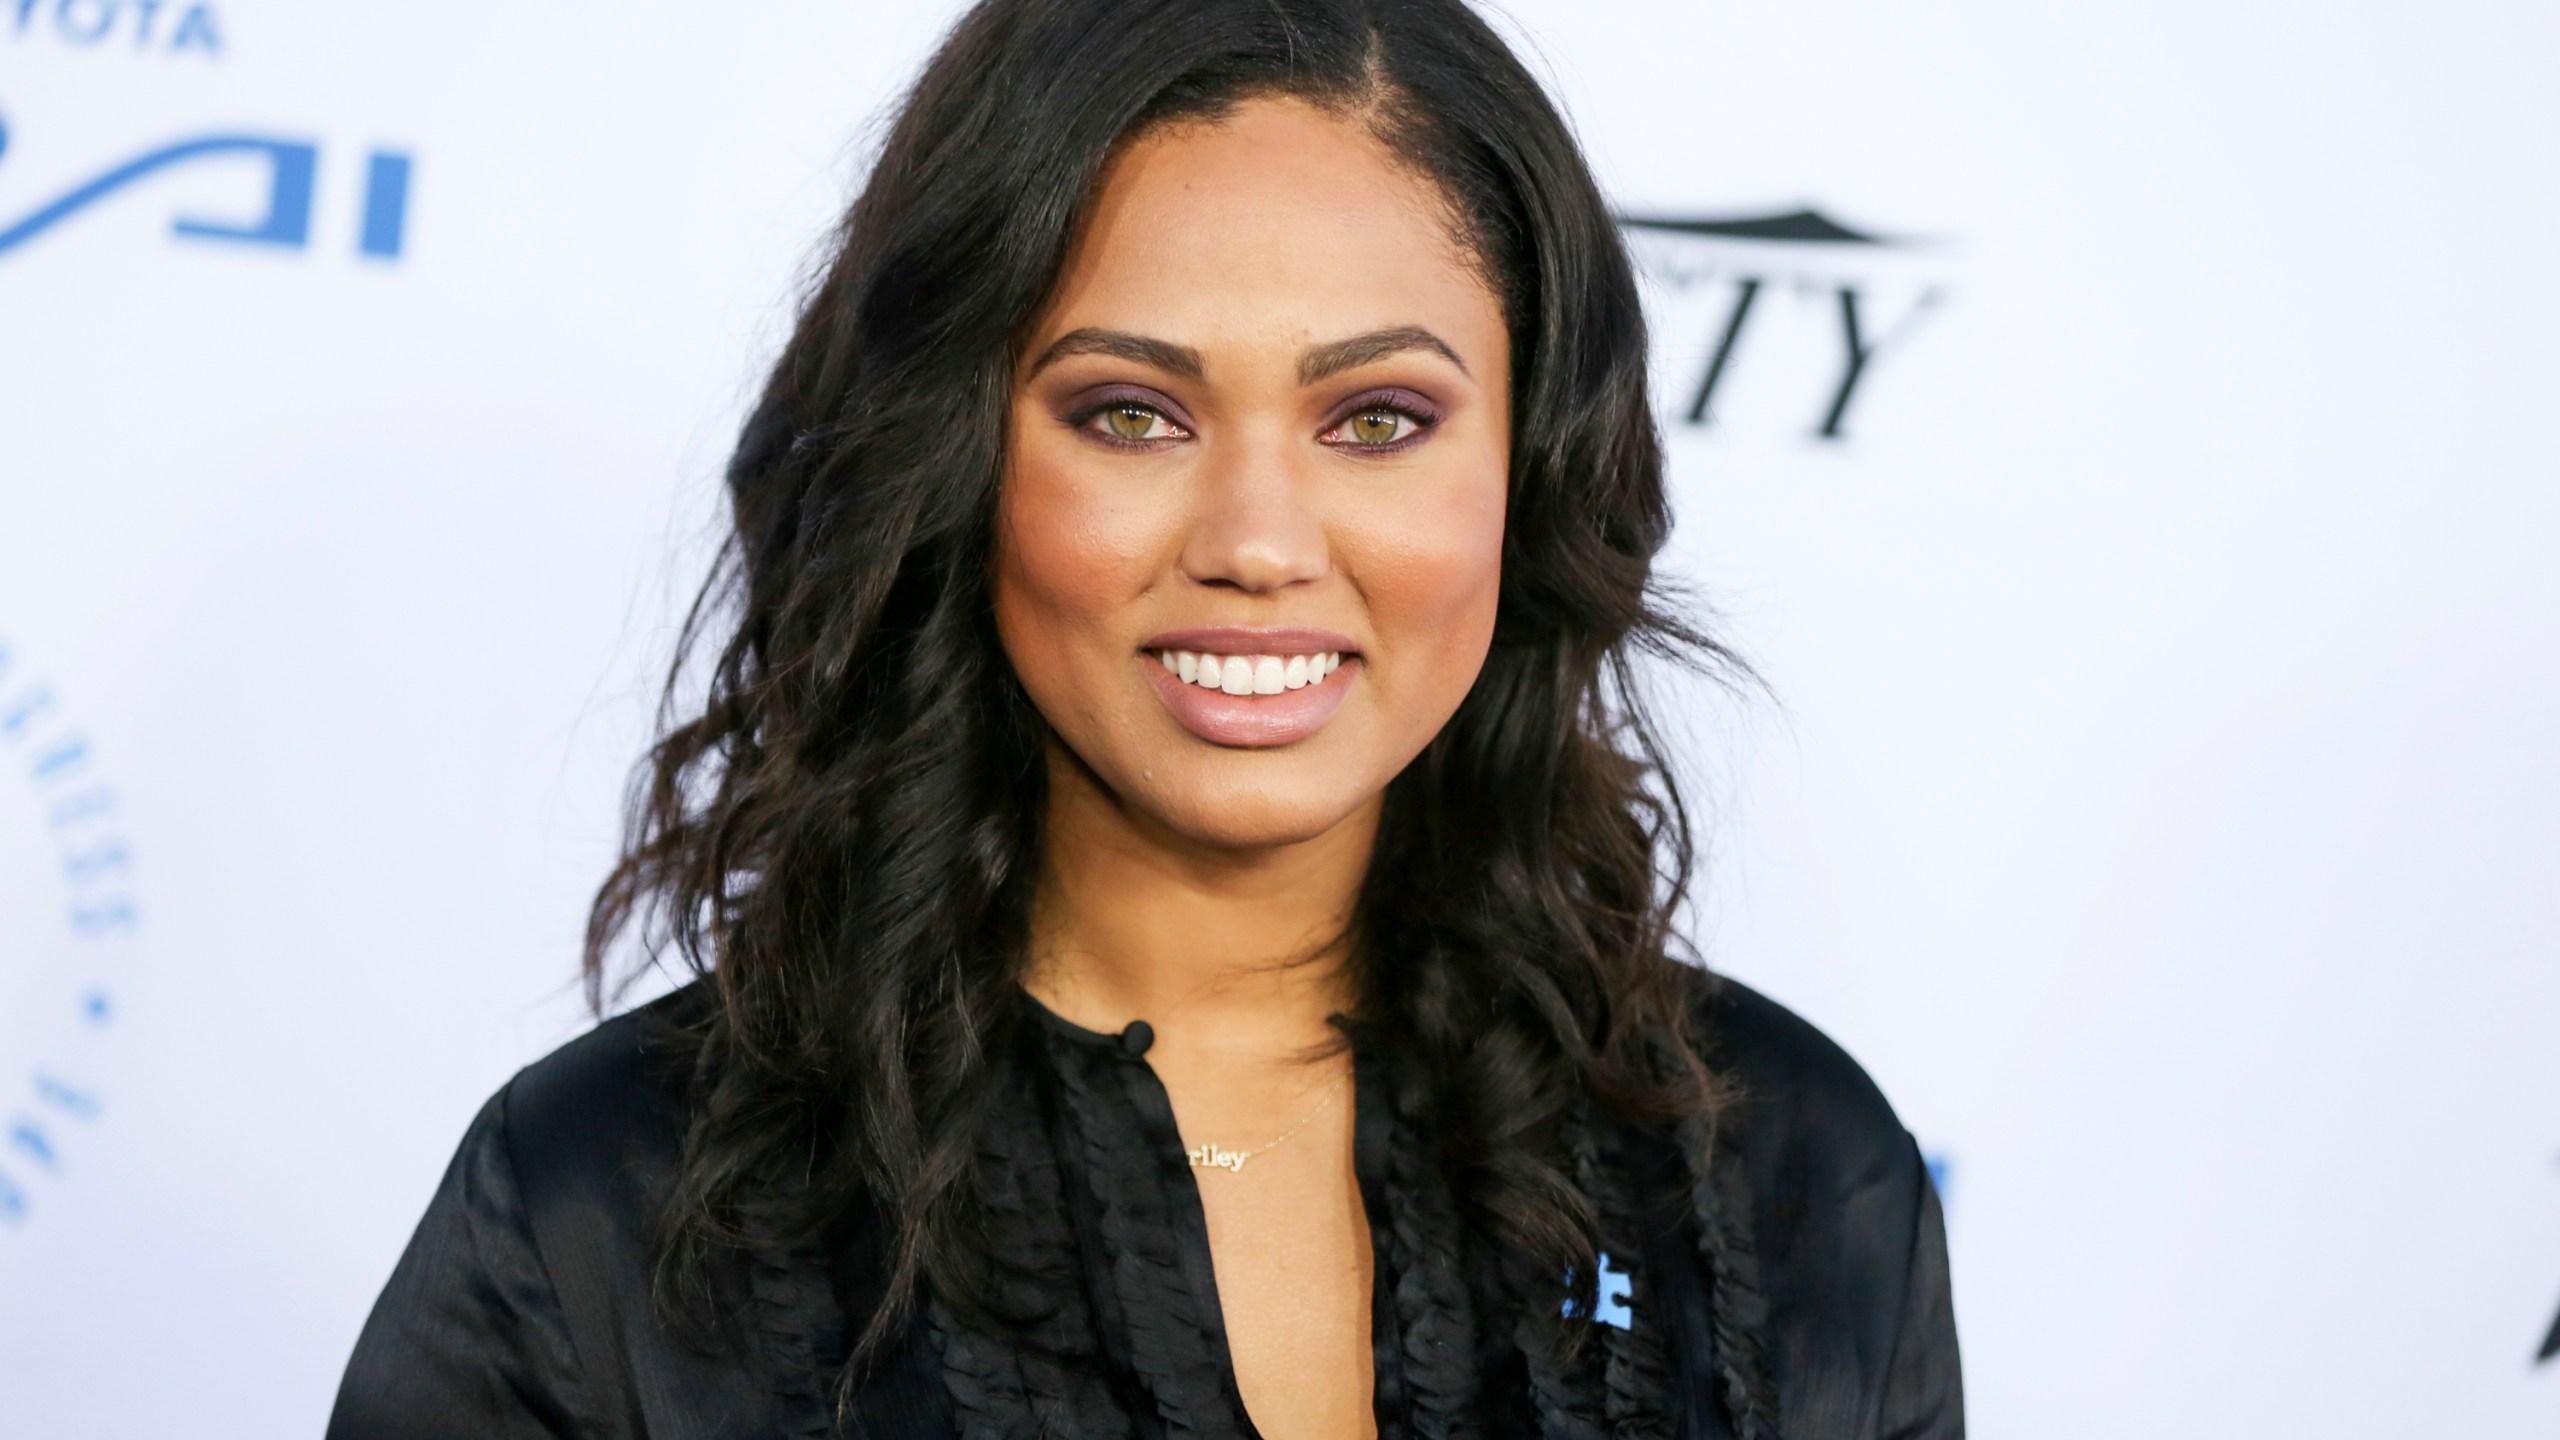 Ayesha Curry